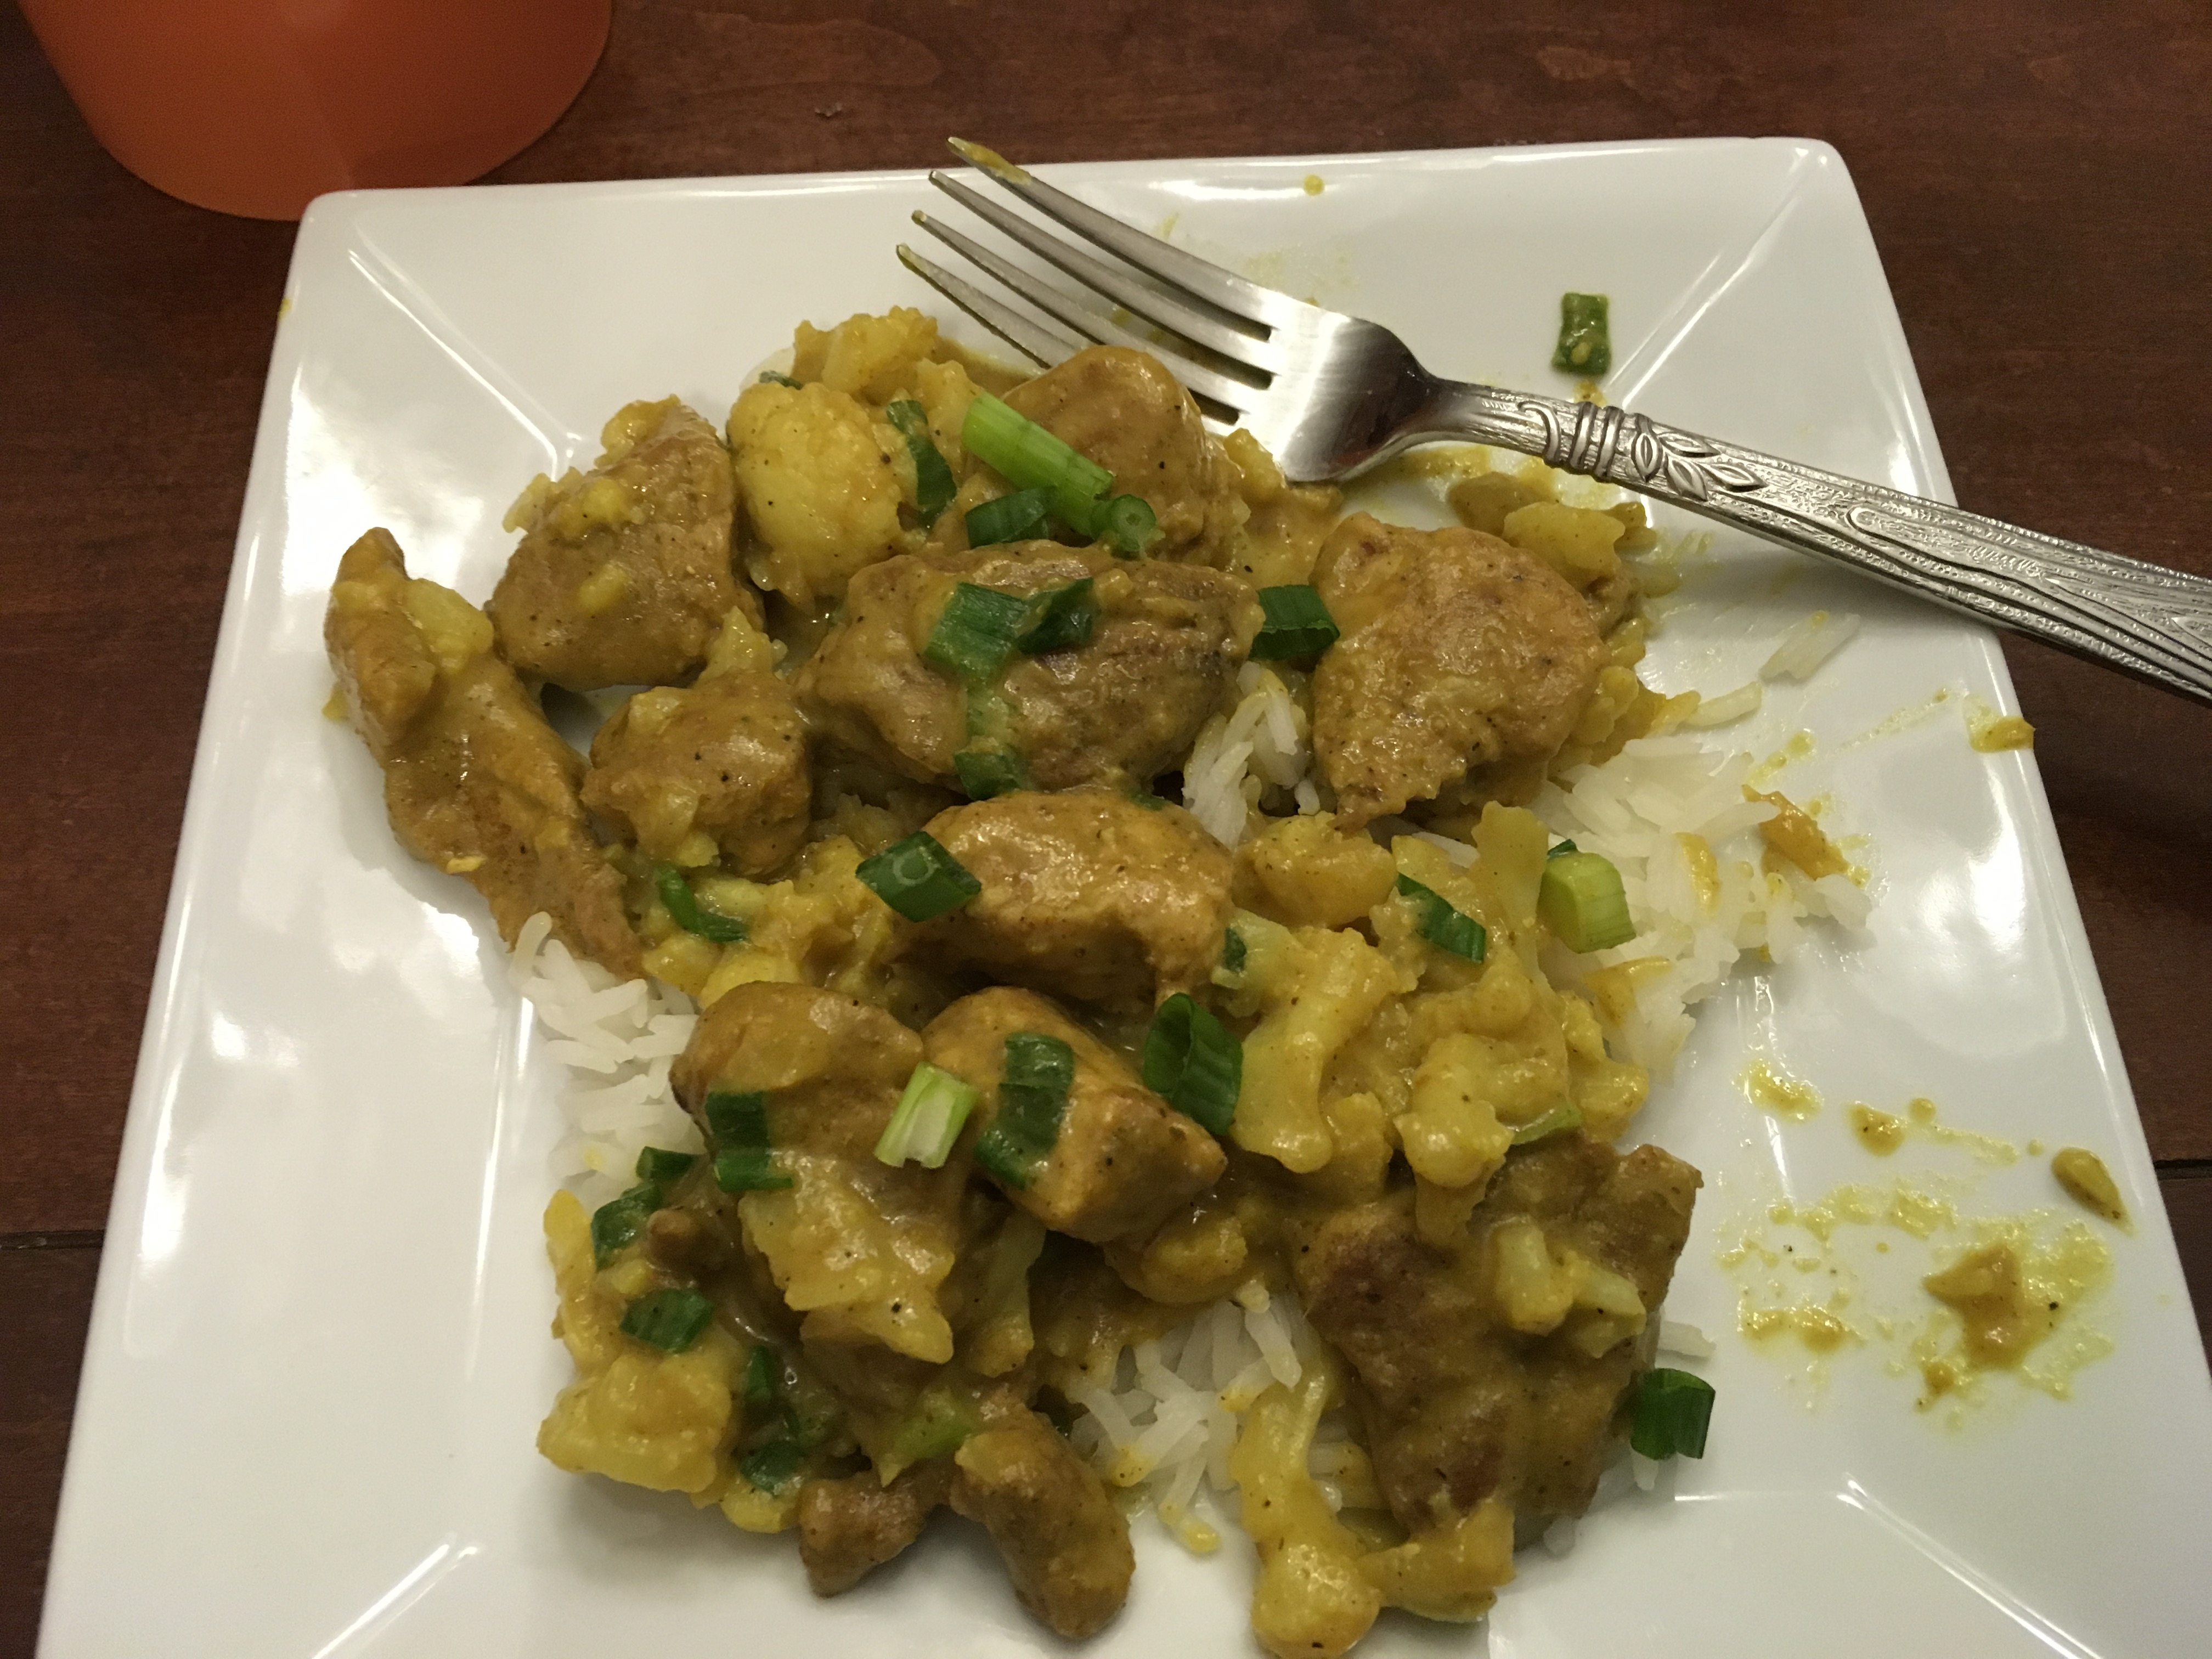 Curried Pork Chops and Cauliflower with Basmati Rice